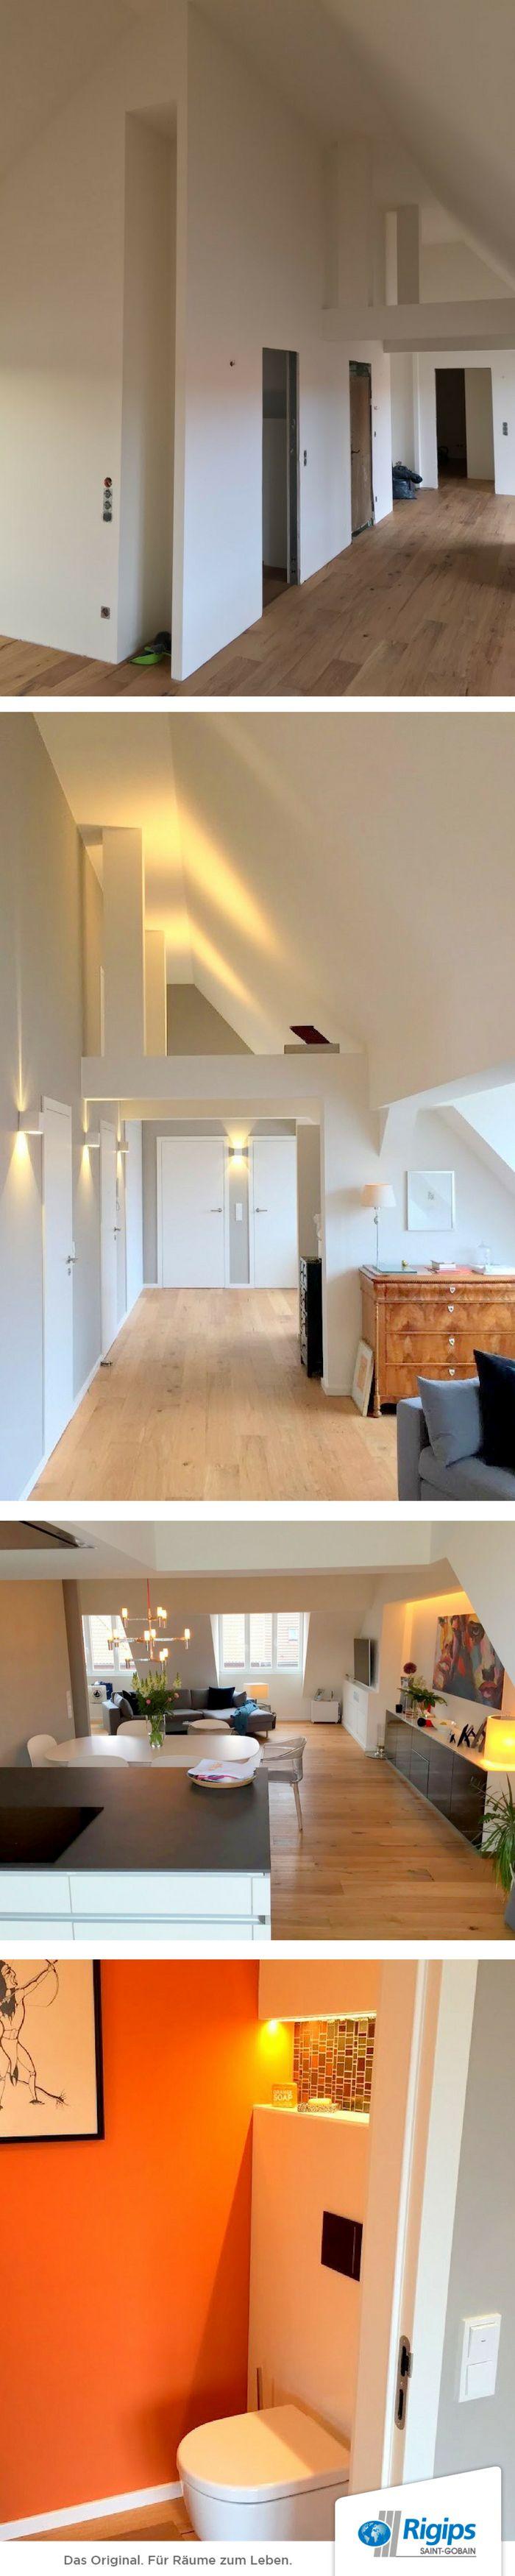 die besten 25 rigips ideen auf pinterest rigips wand tv wand do it yourself und trockenbauwand. Black Bedroom Furniture Sets. Home Design Ideas